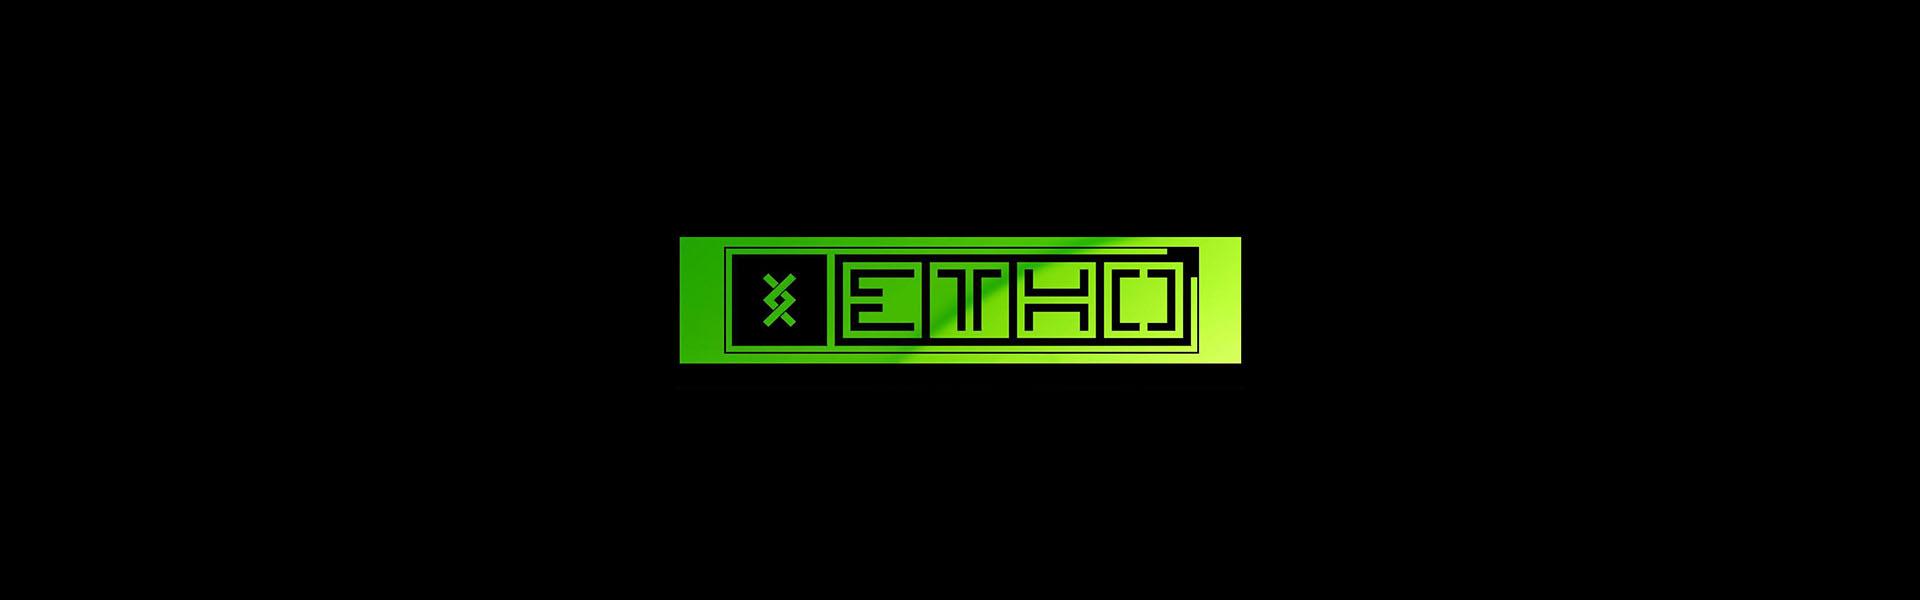 Ethò Club di Marzocca